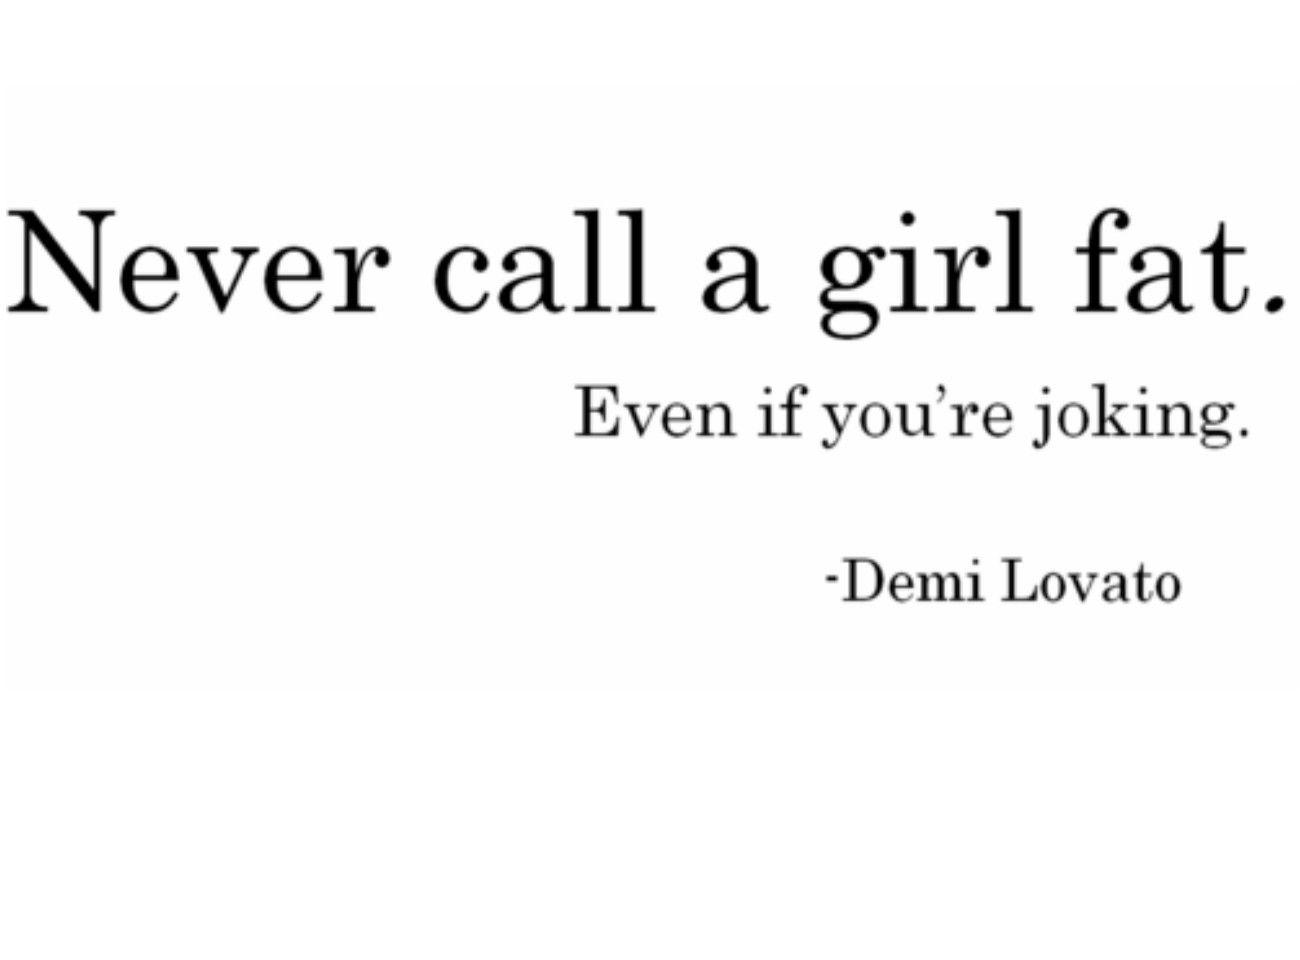 how to call a call girl